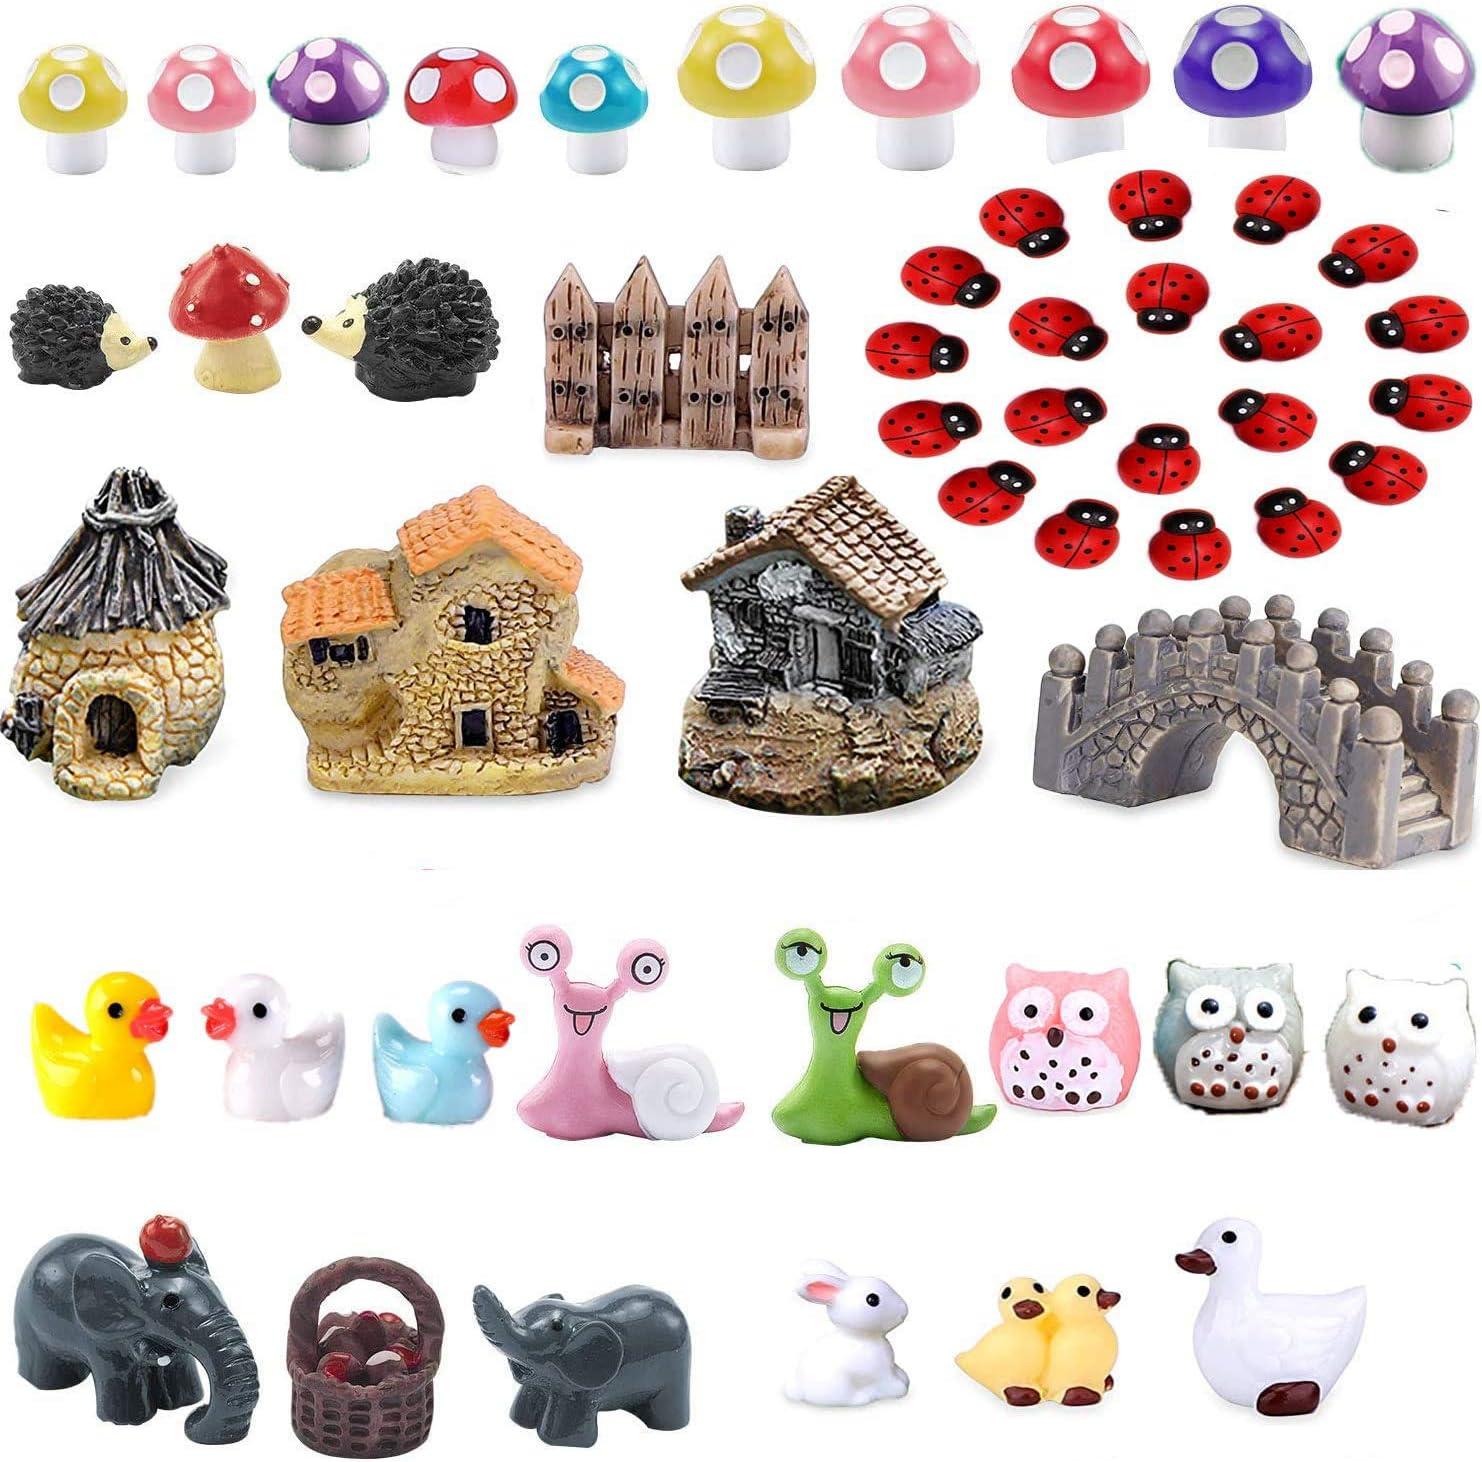 52 Pieces Miniature Fairy Garden Accessories DIY Kit ,Mini Animals Miniature Figurines Craft Dollhouse Plant Decoration (1)